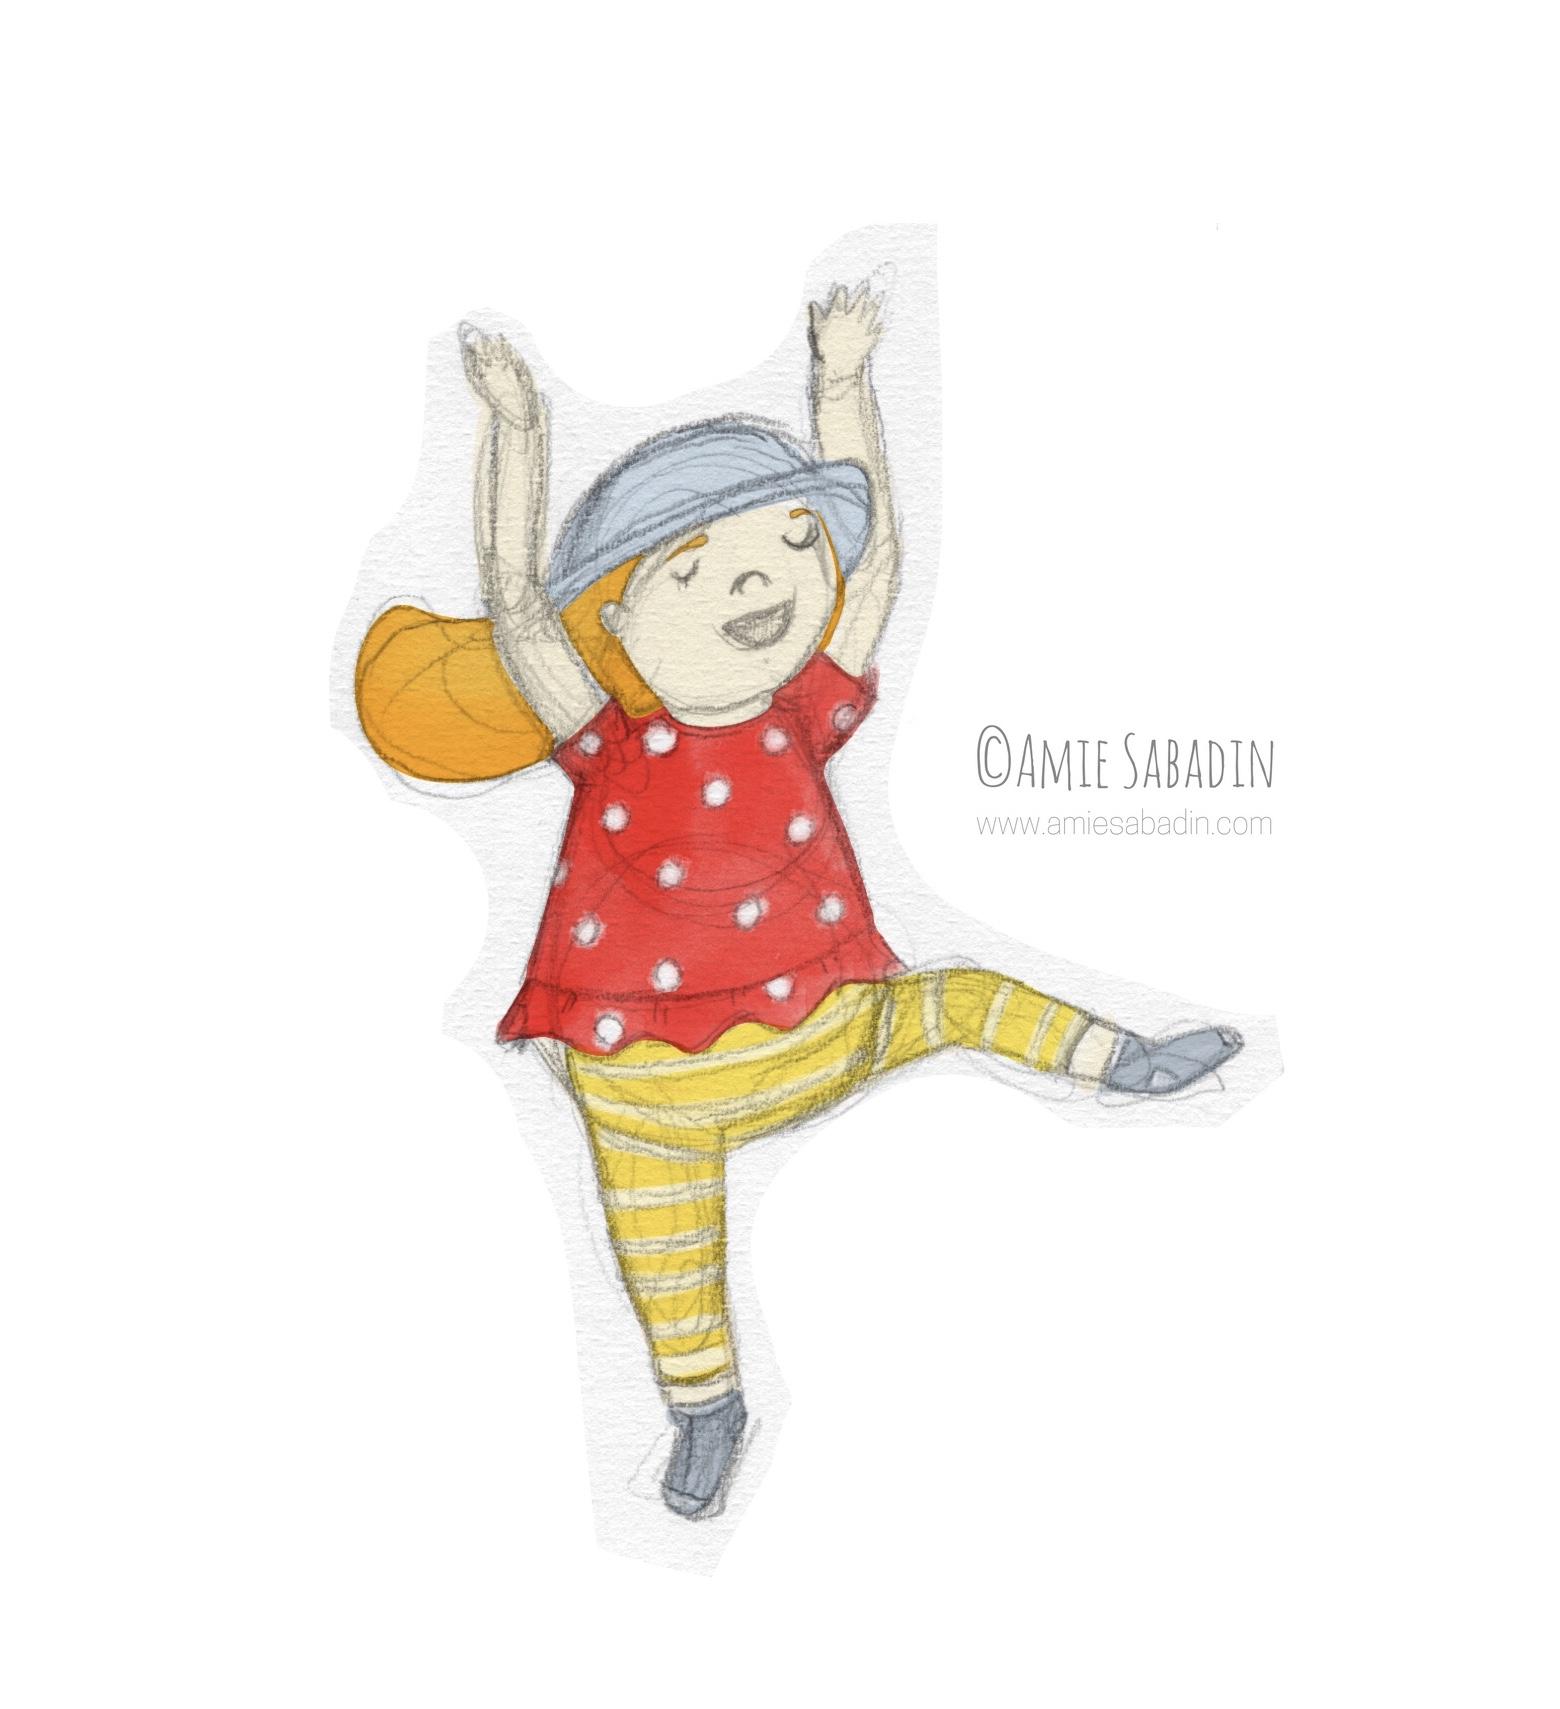 Dancing girl illustration by Amie Sabadin